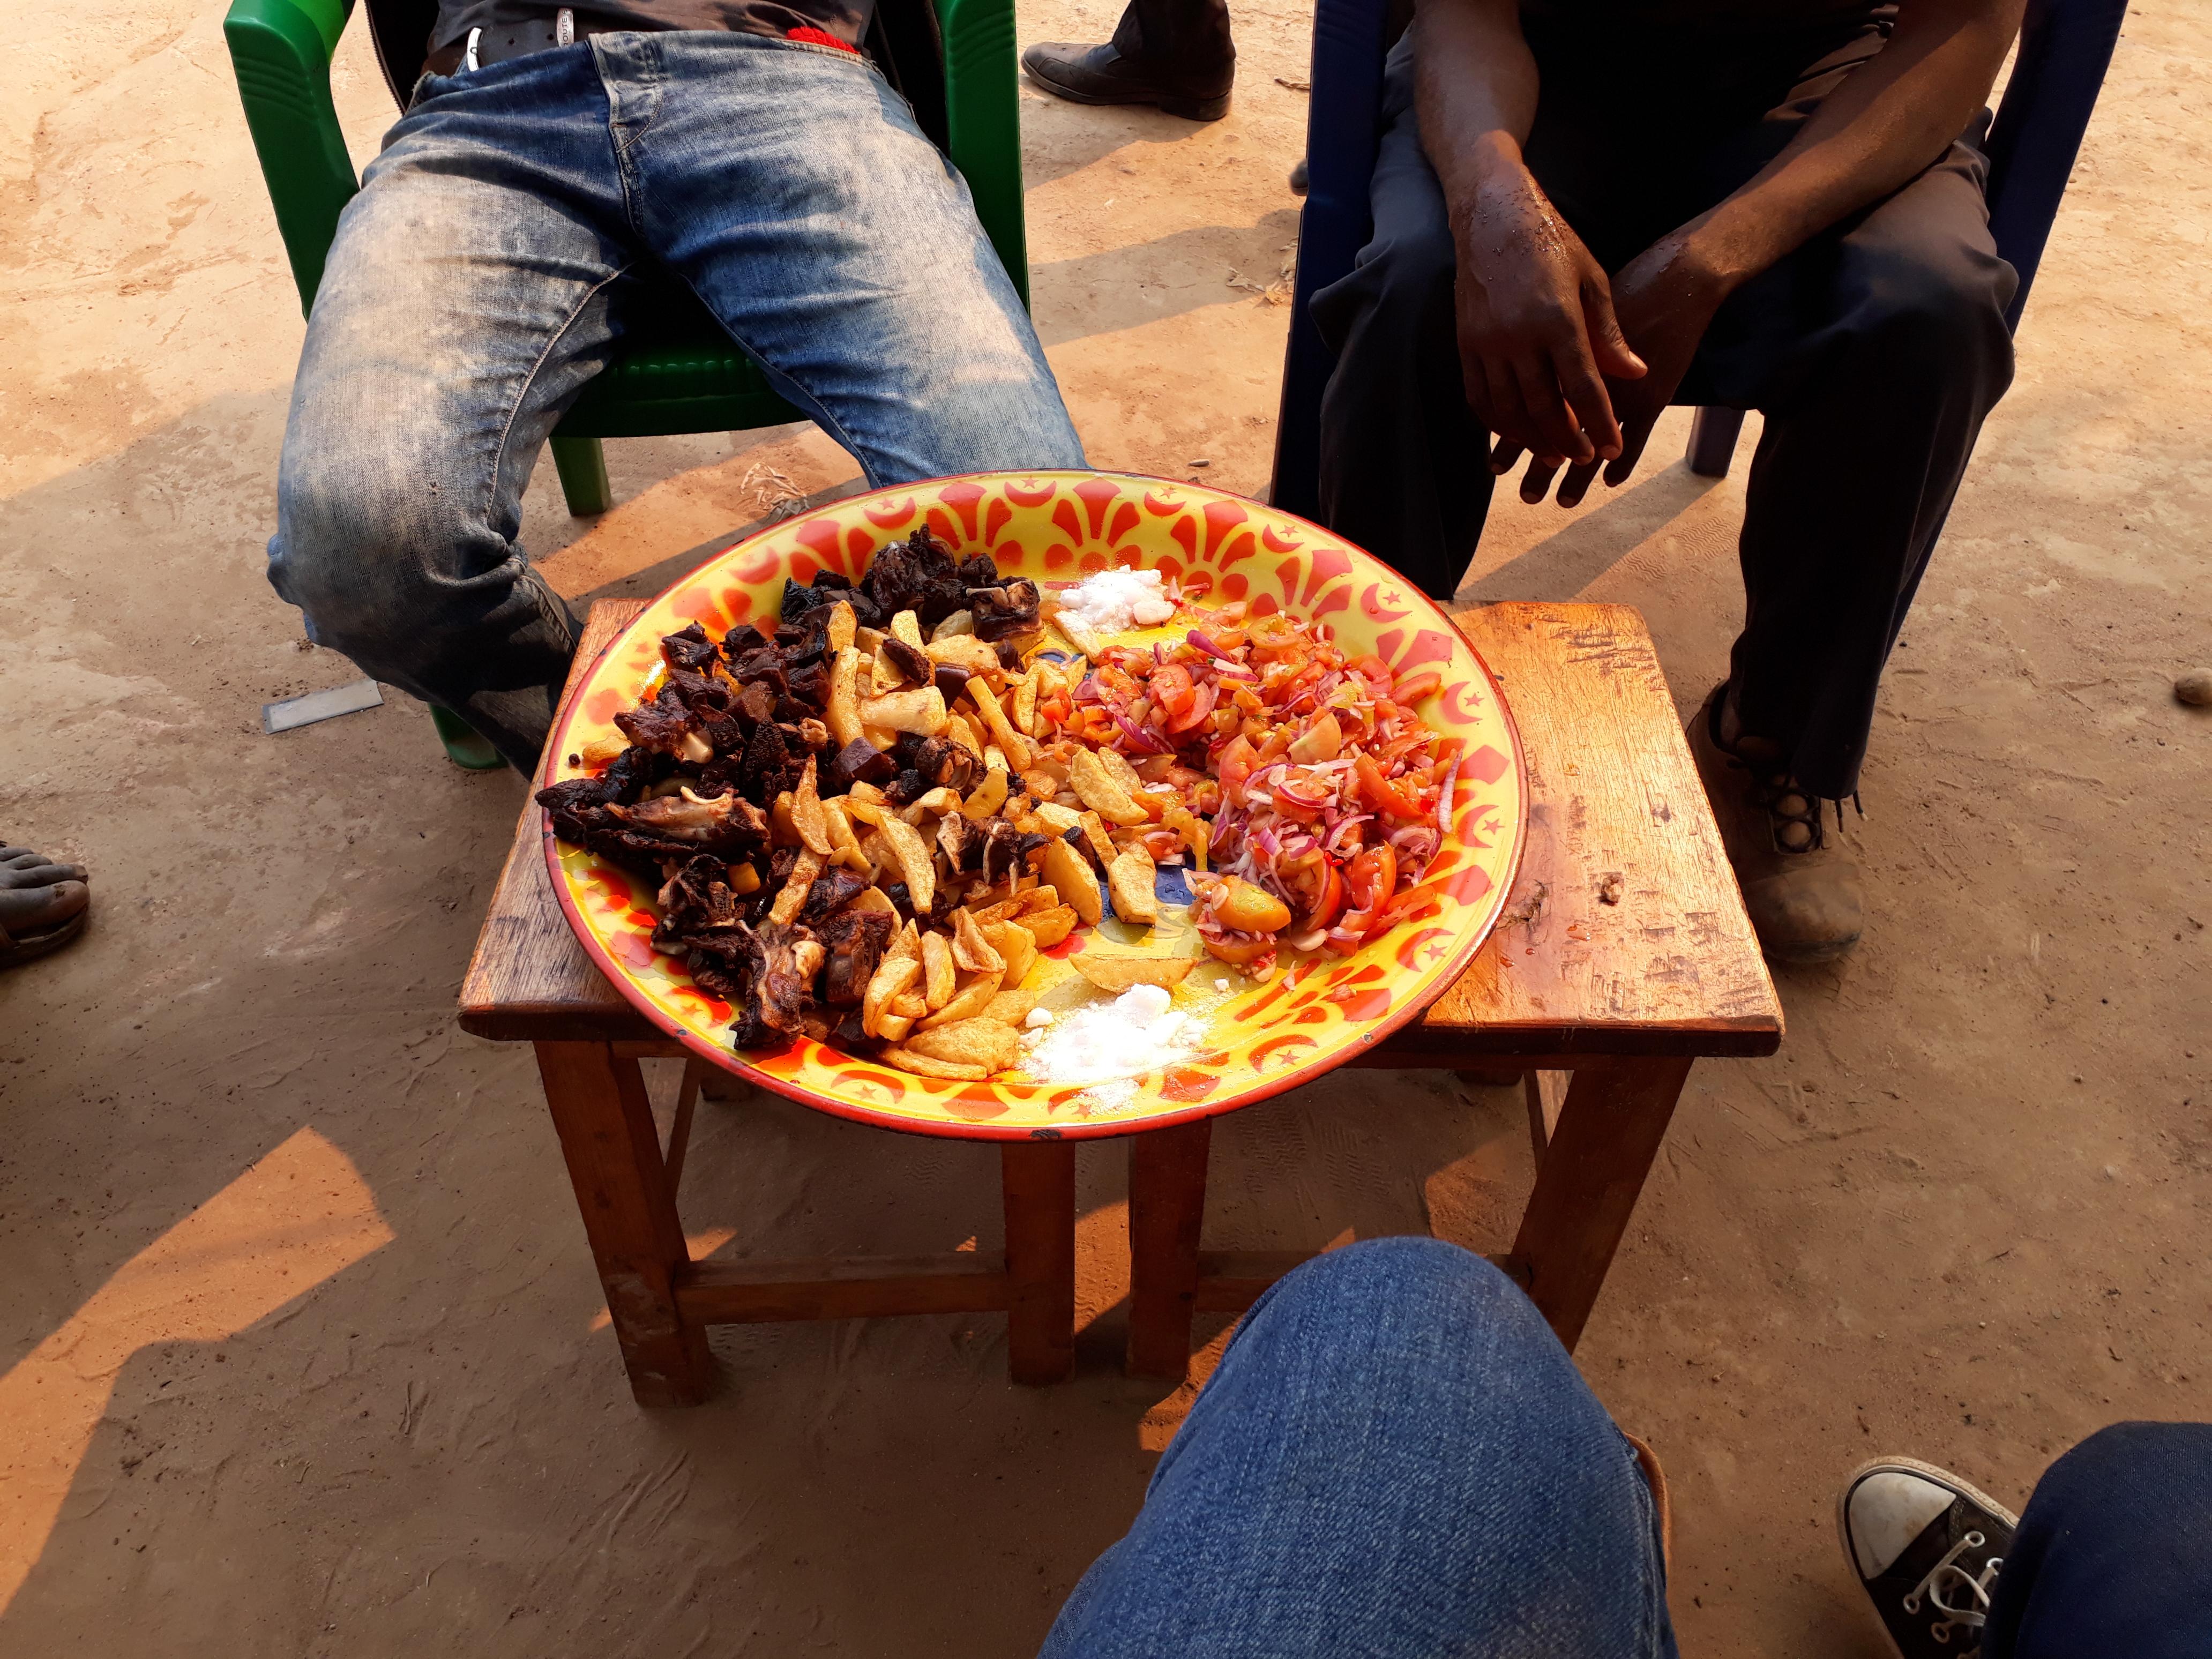 Schweinefleisch, Chipsi und Kachumbari (scharfer Tomatensalat)